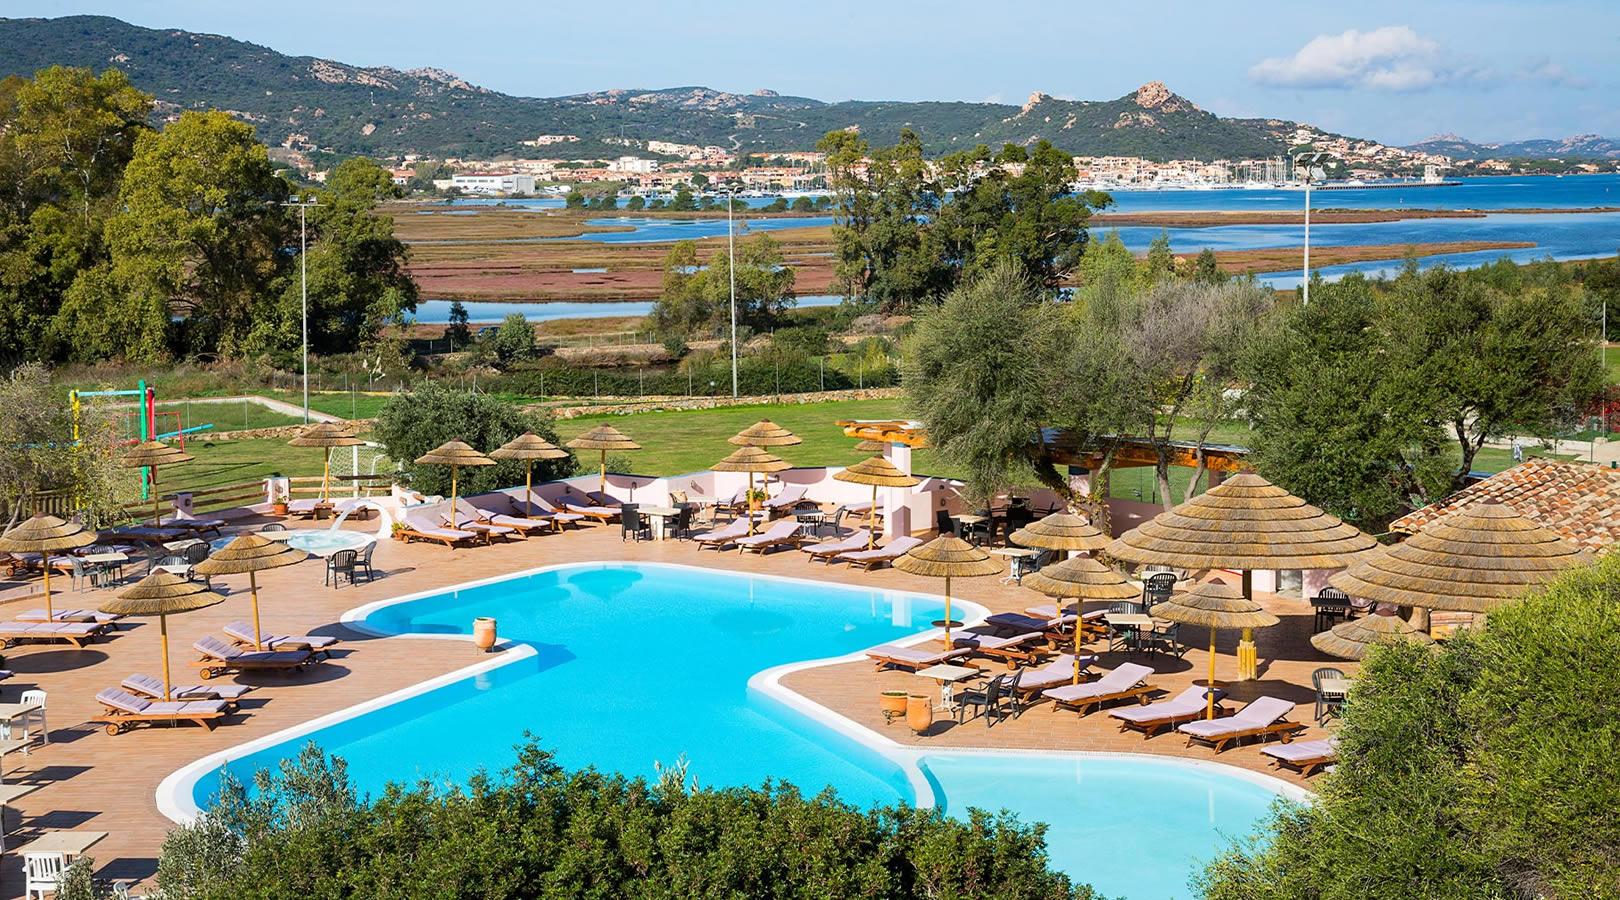 gruppo-felix-hotels-airone-arzachena-sardegna13